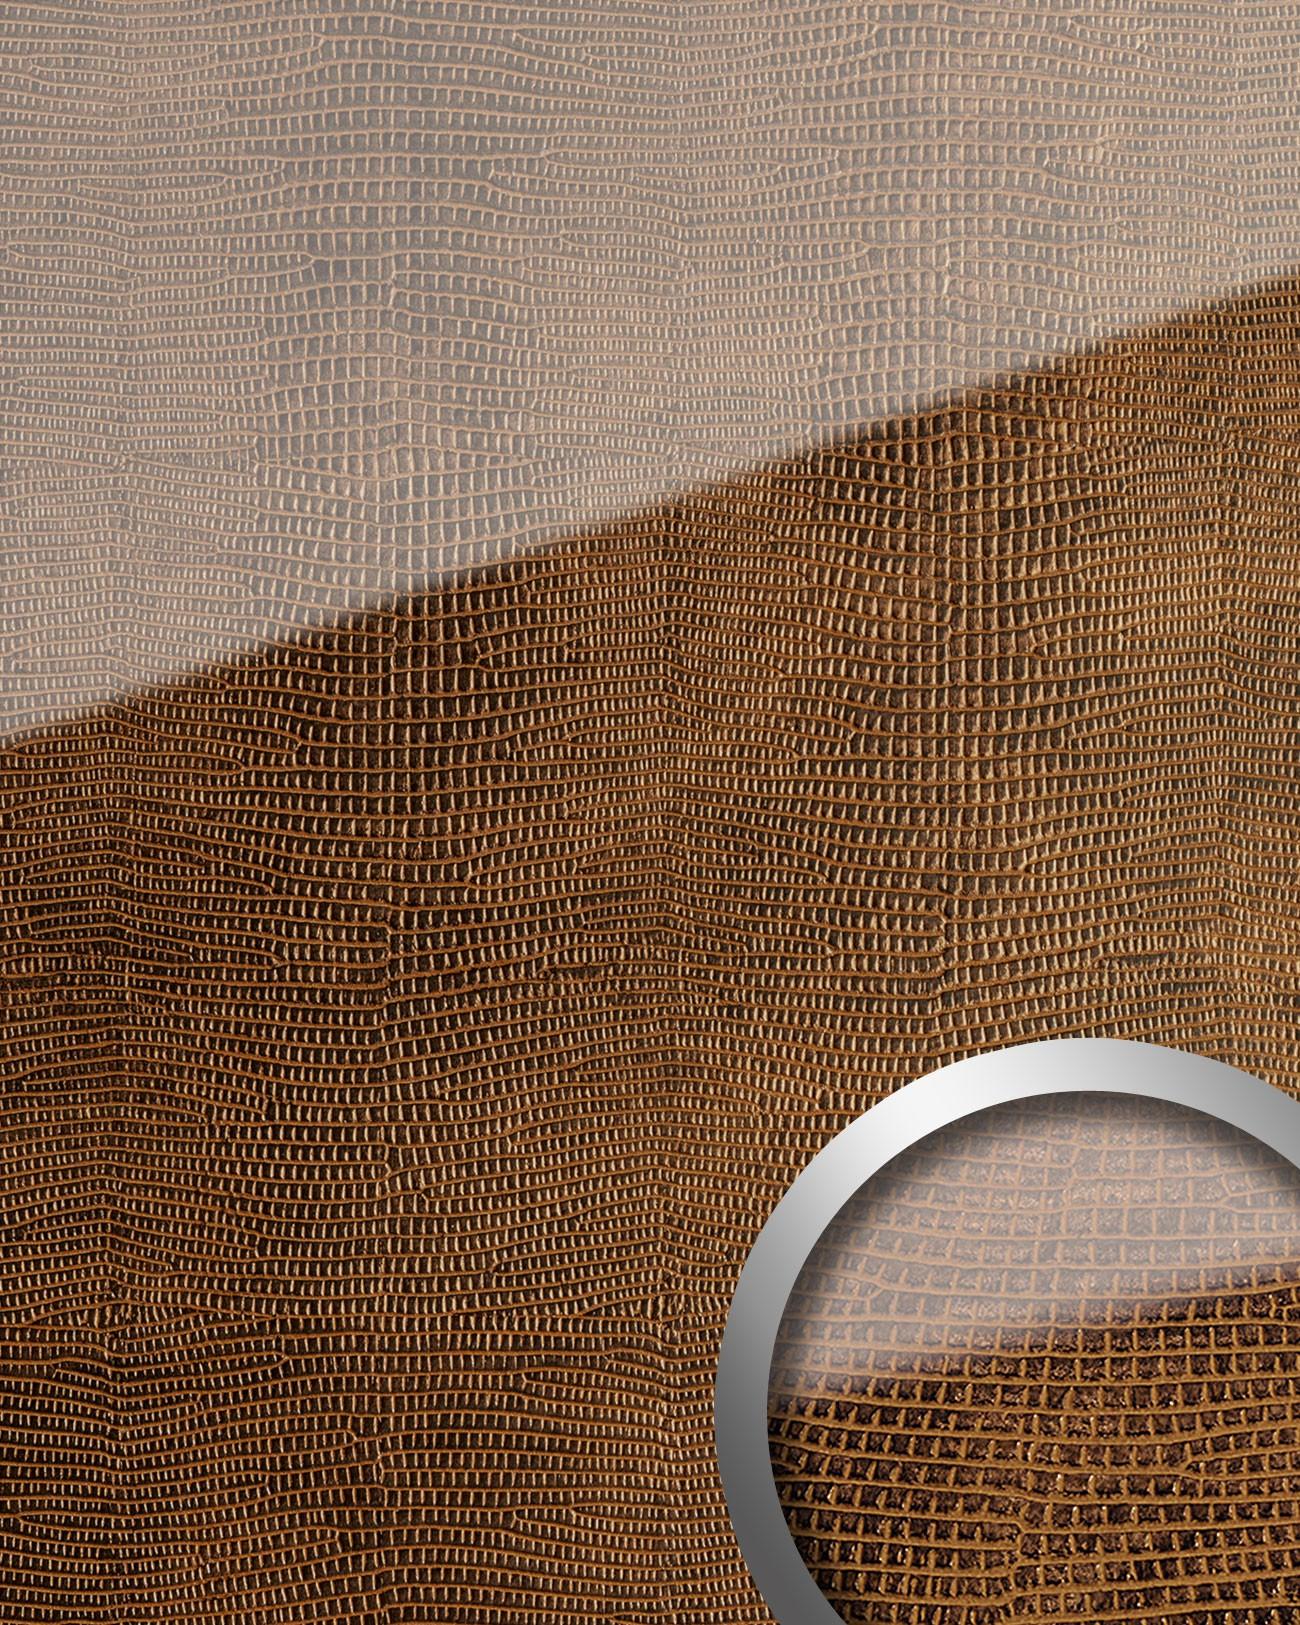 wandpaneel glas optik wallface 16972 leguan kupfer braun original wallface braun kupferbraun. Black Bedroom Furniture Sets. Home Design Ideas